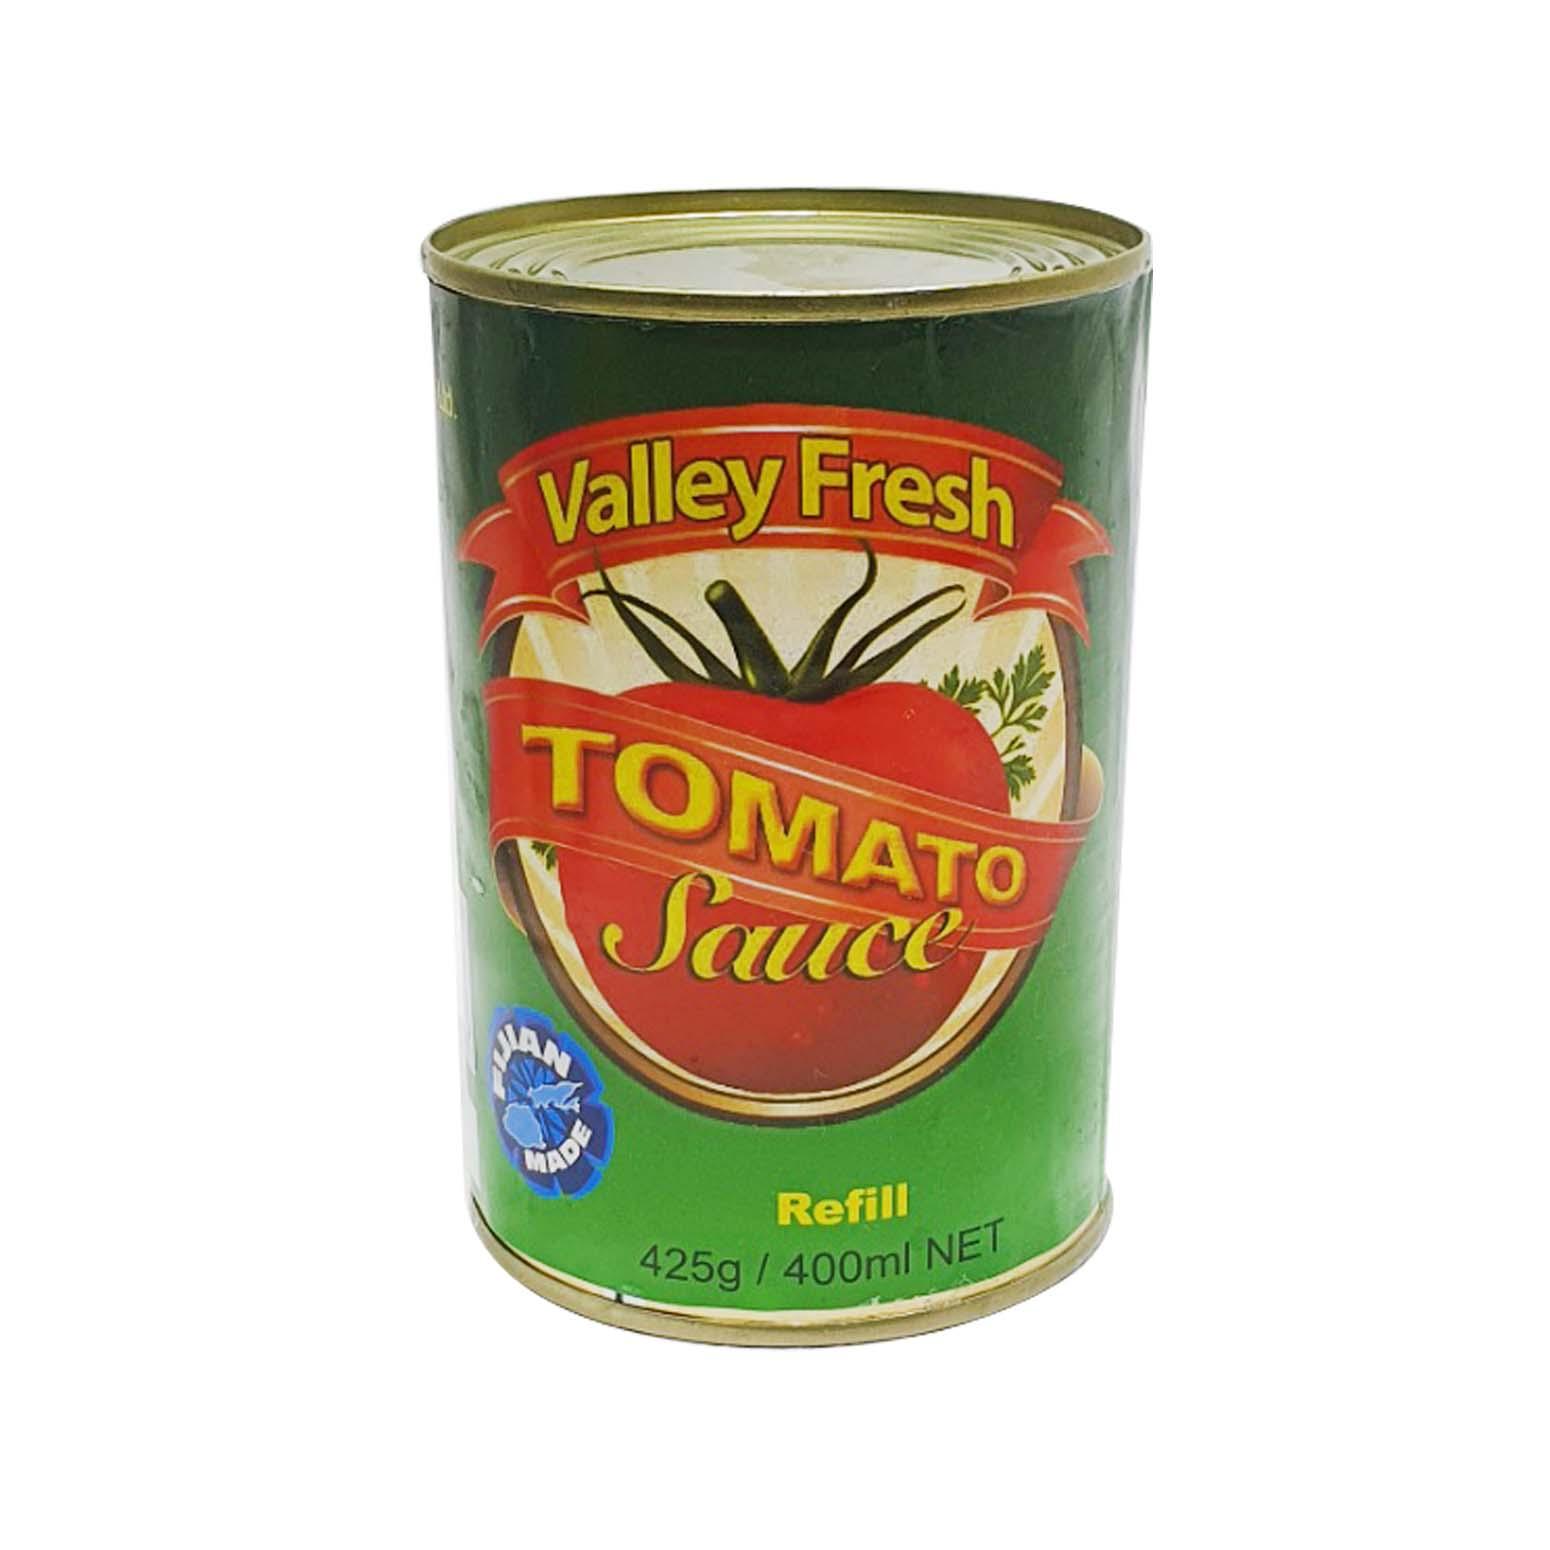 Valley Fresh Tomato Sauce 425g